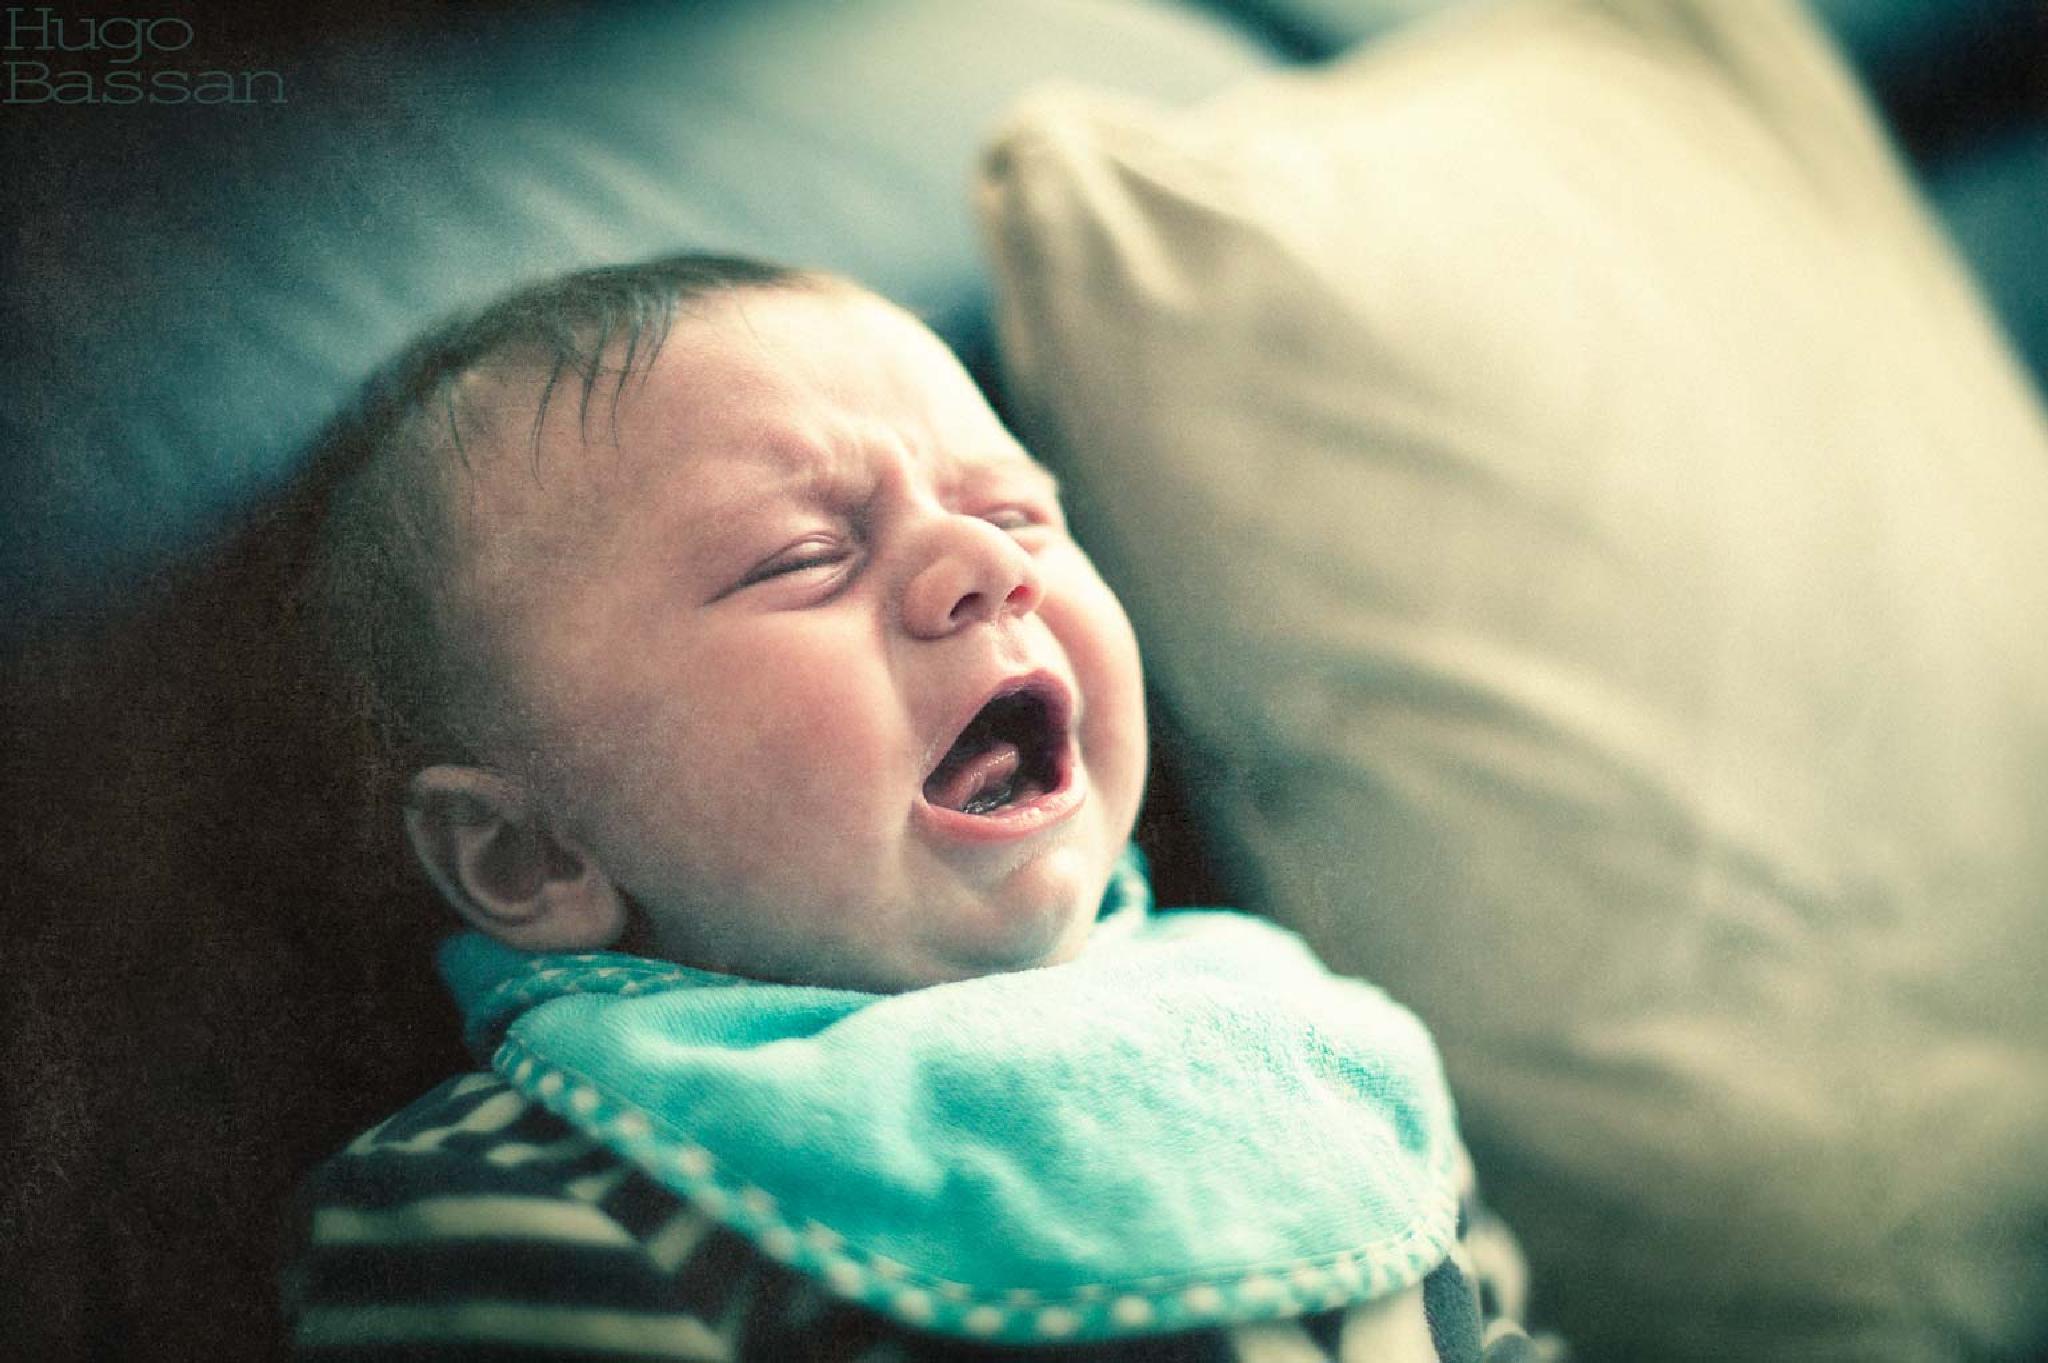 Angry baby by Hugo Bassan